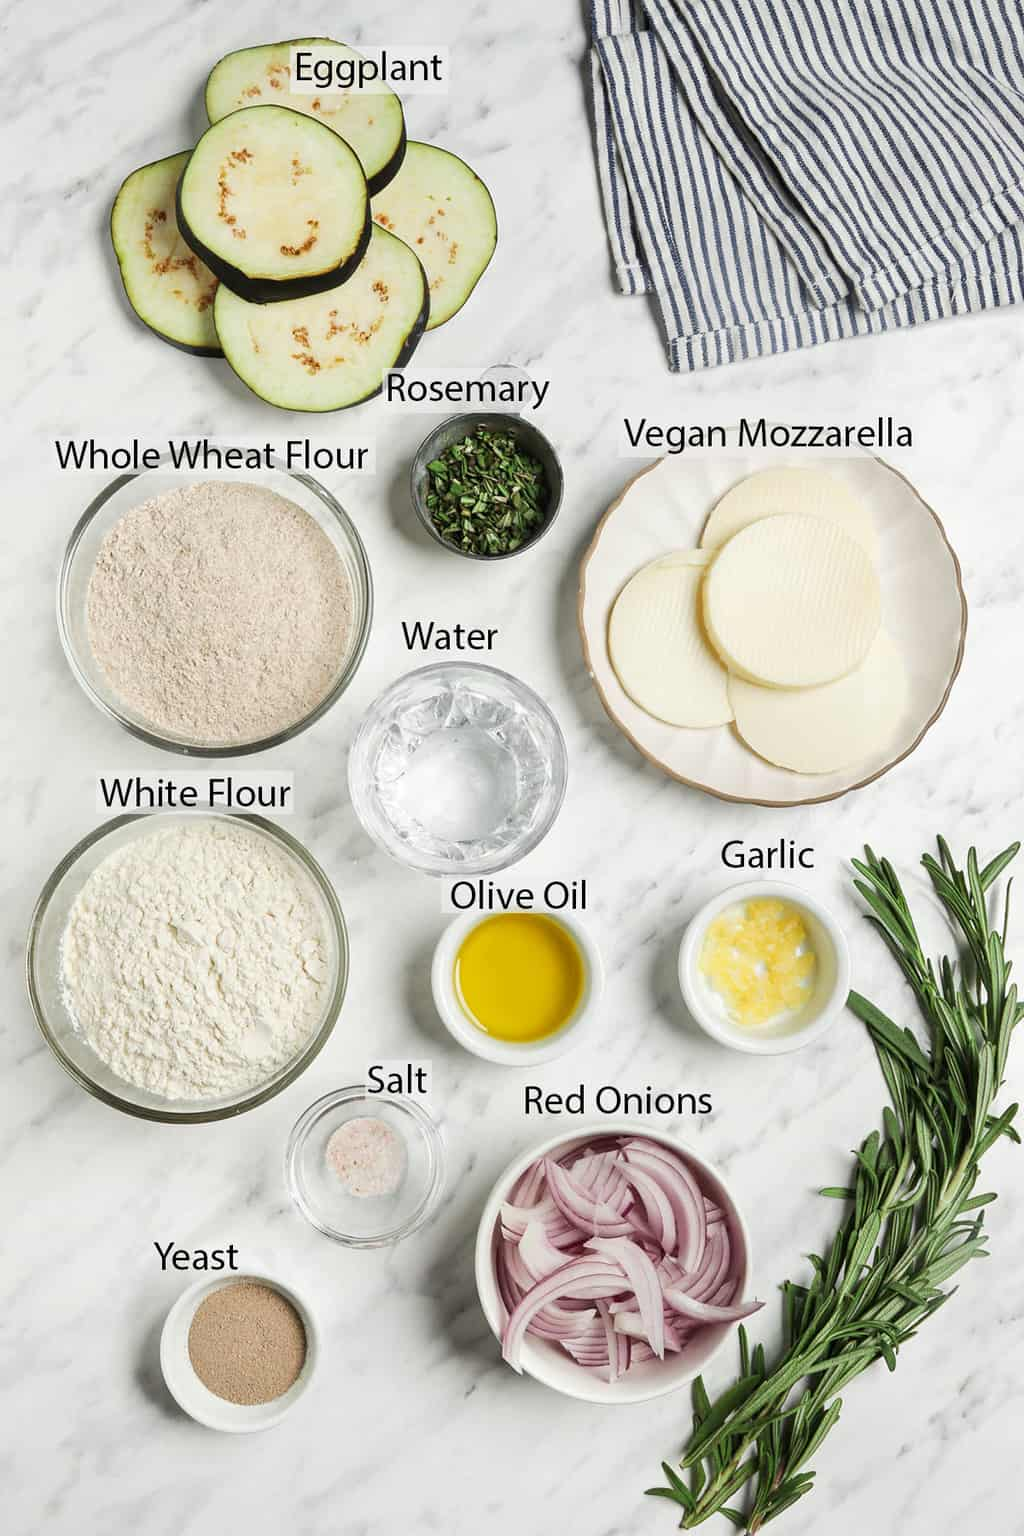 ingredients for eggplant pizza